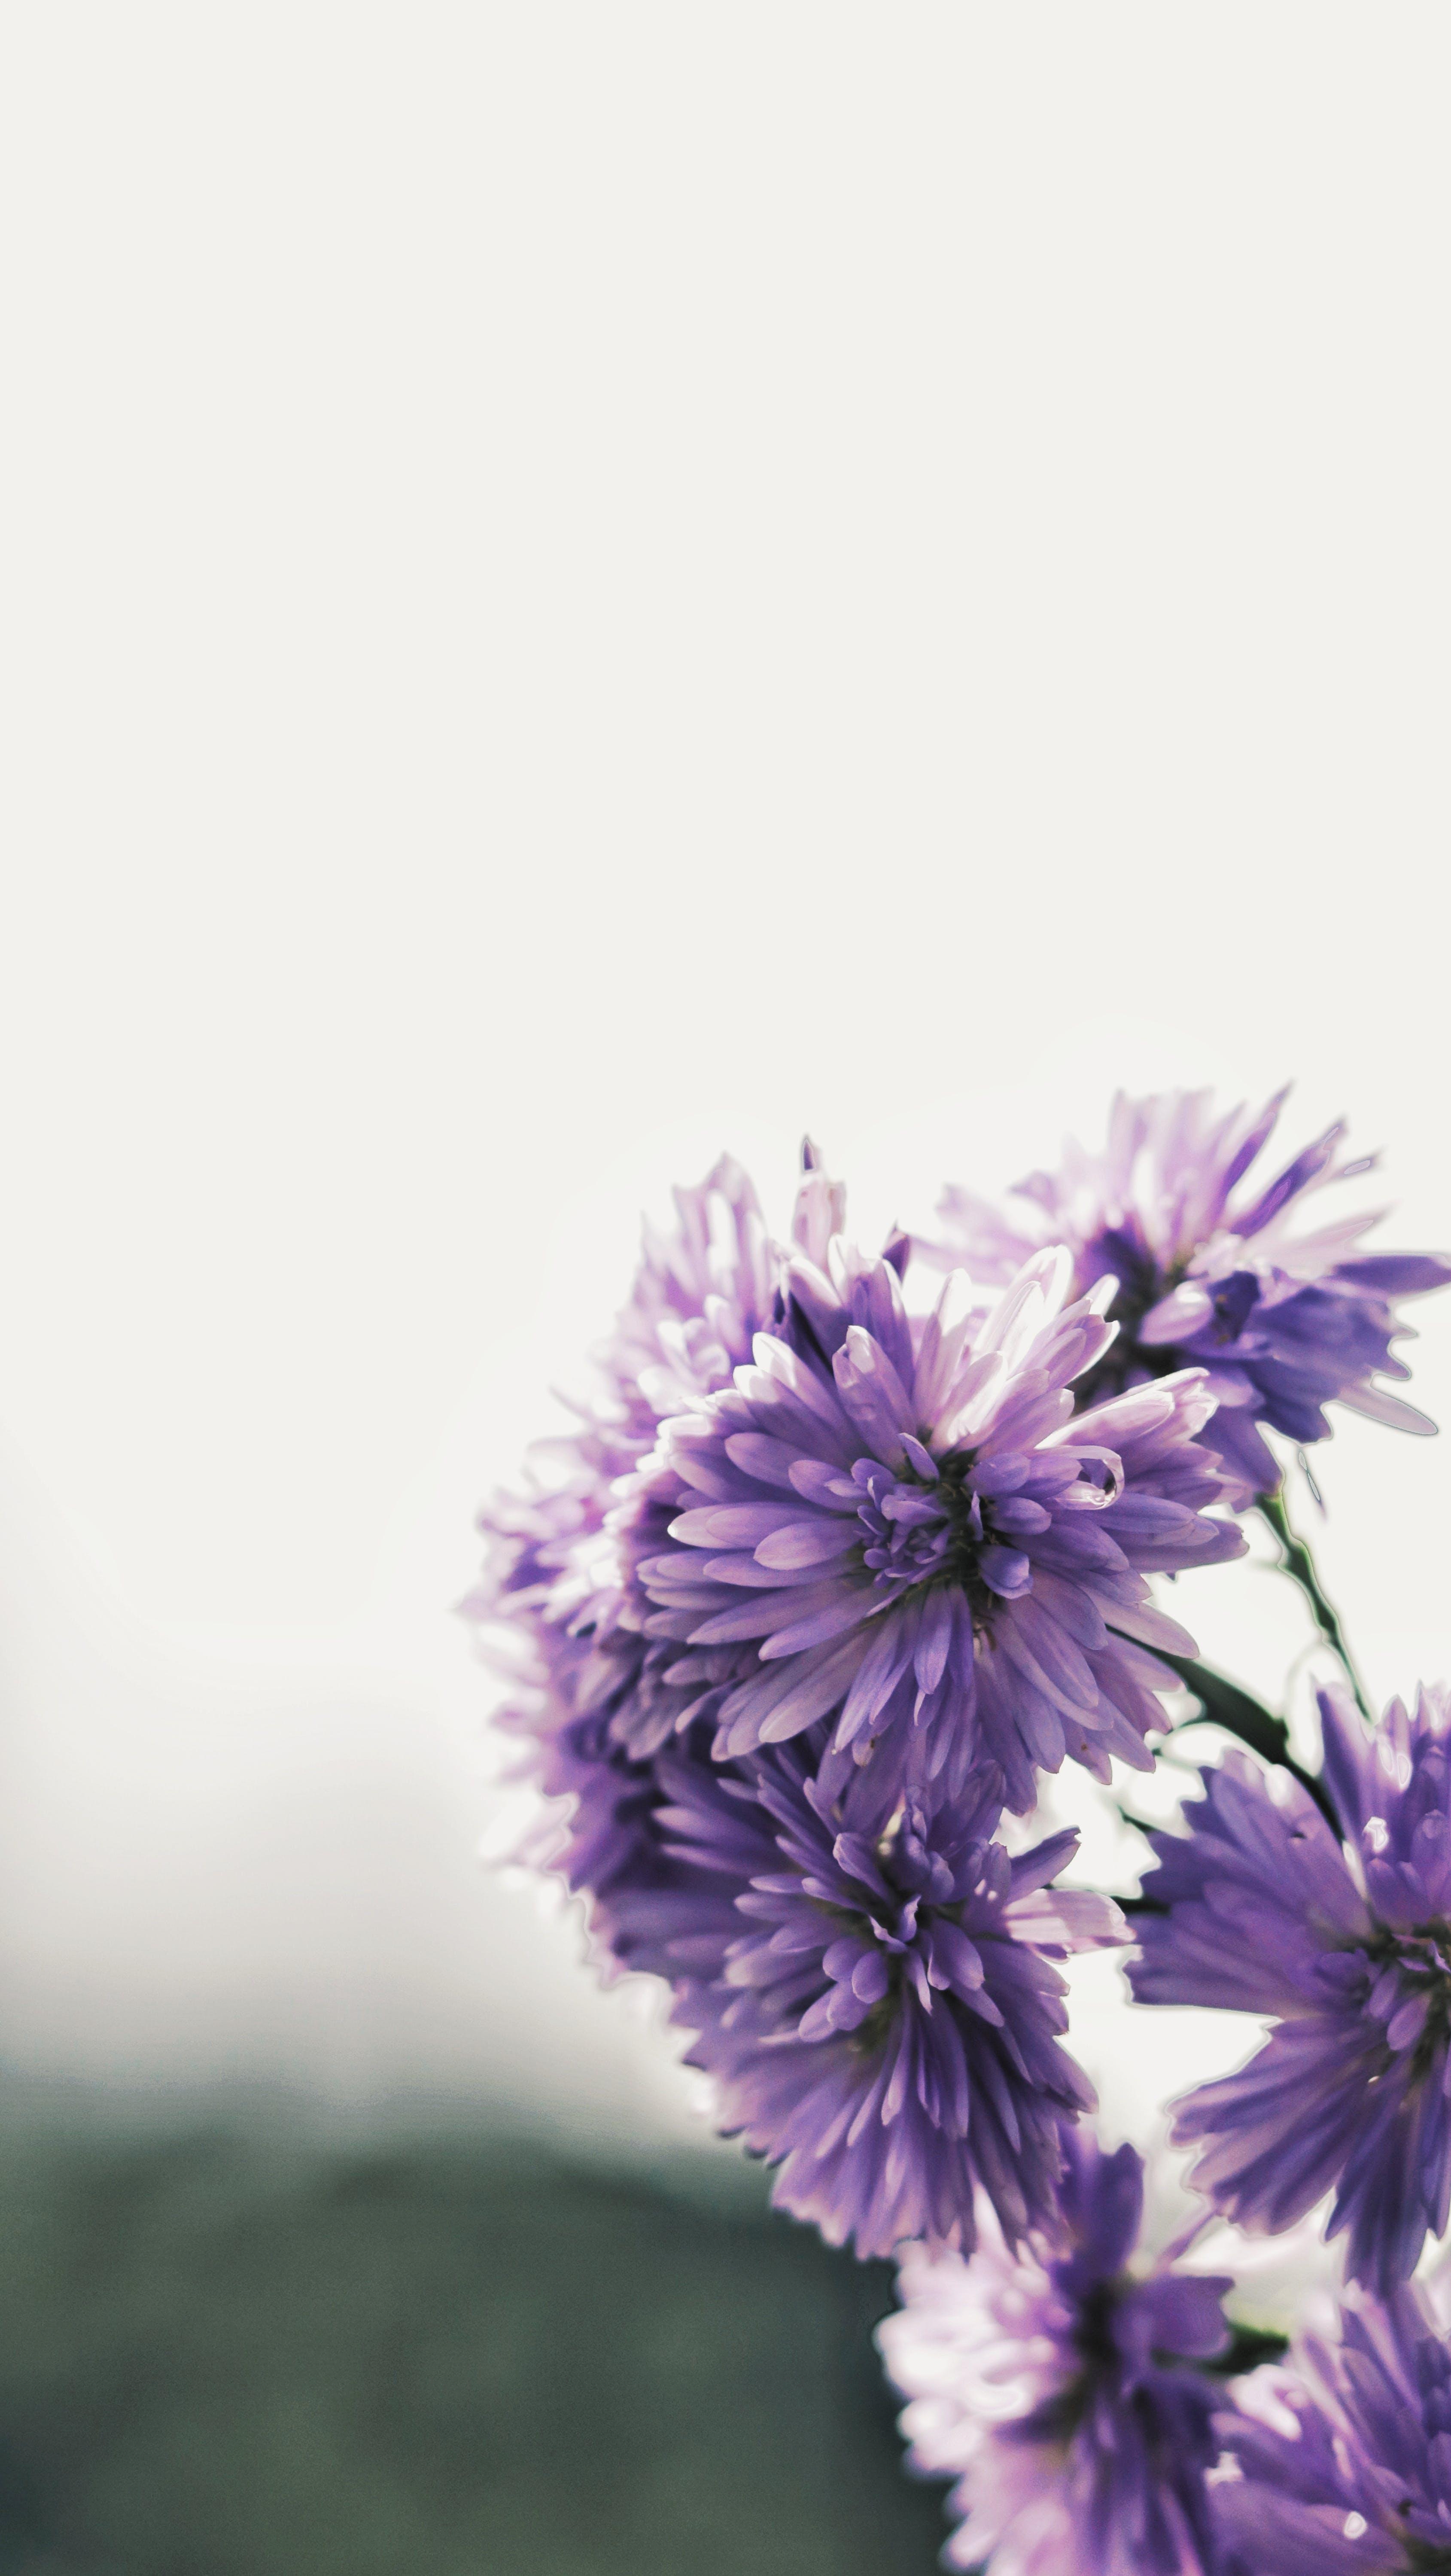 Free stock photo of nature, sky, purple, flower